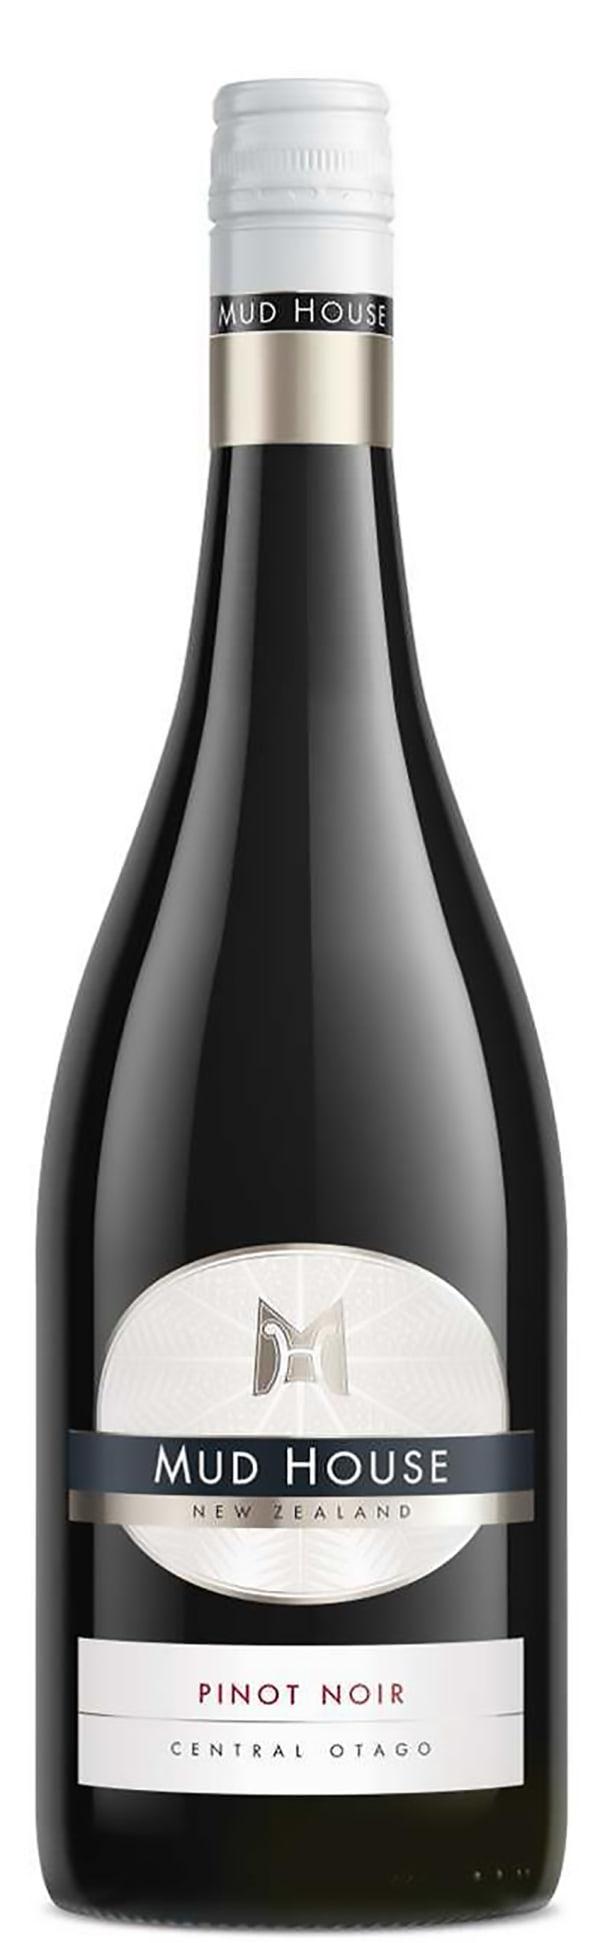 Mud House Central Otago Pinot Noir 2018